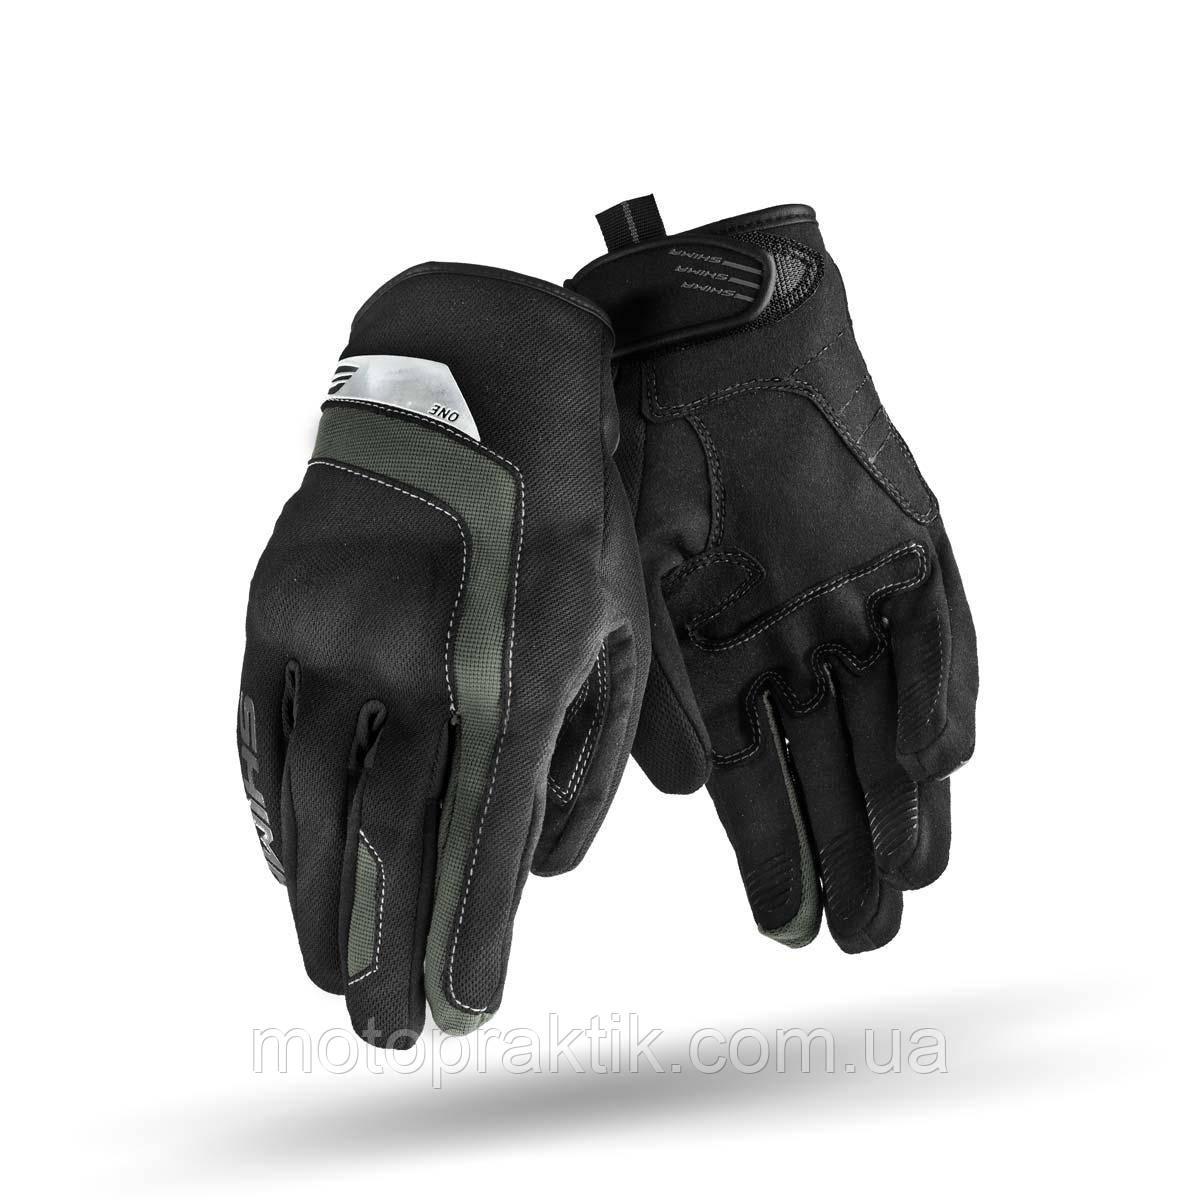 SHIMA ONE Gloves Black, Мотоперчатки летние